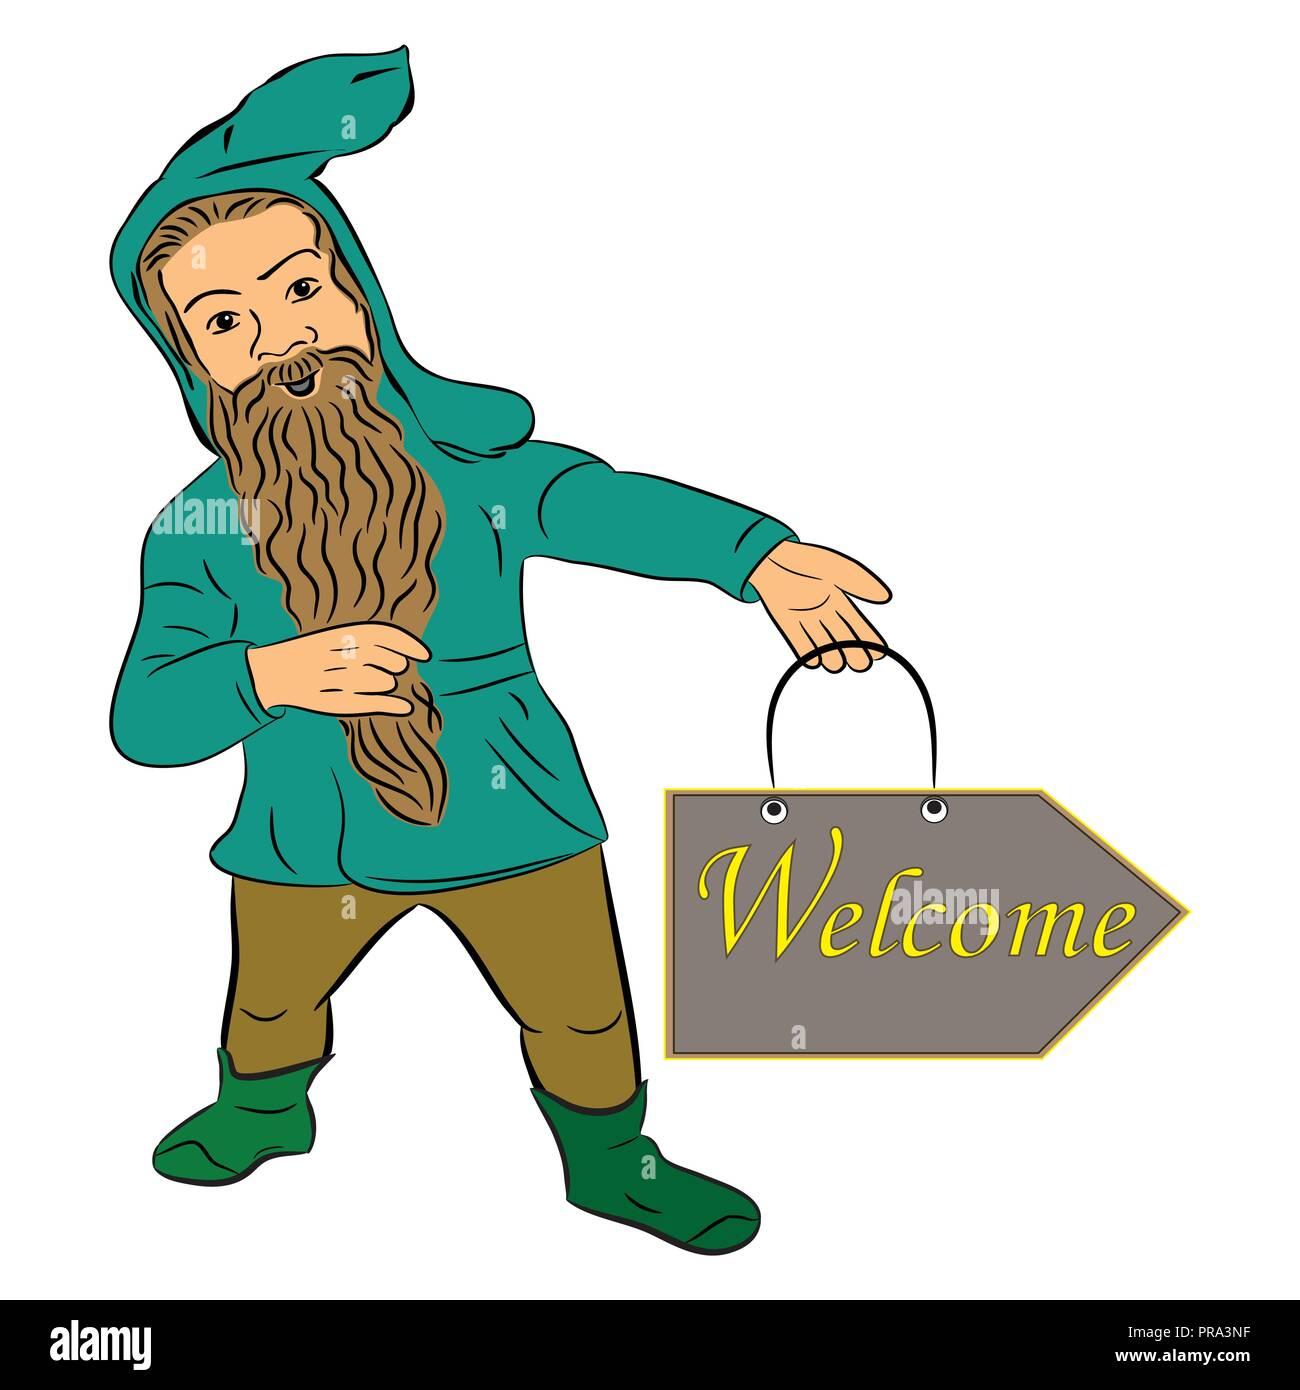 Dwarfs. Funny dwarf. banner welcome - Stock Image